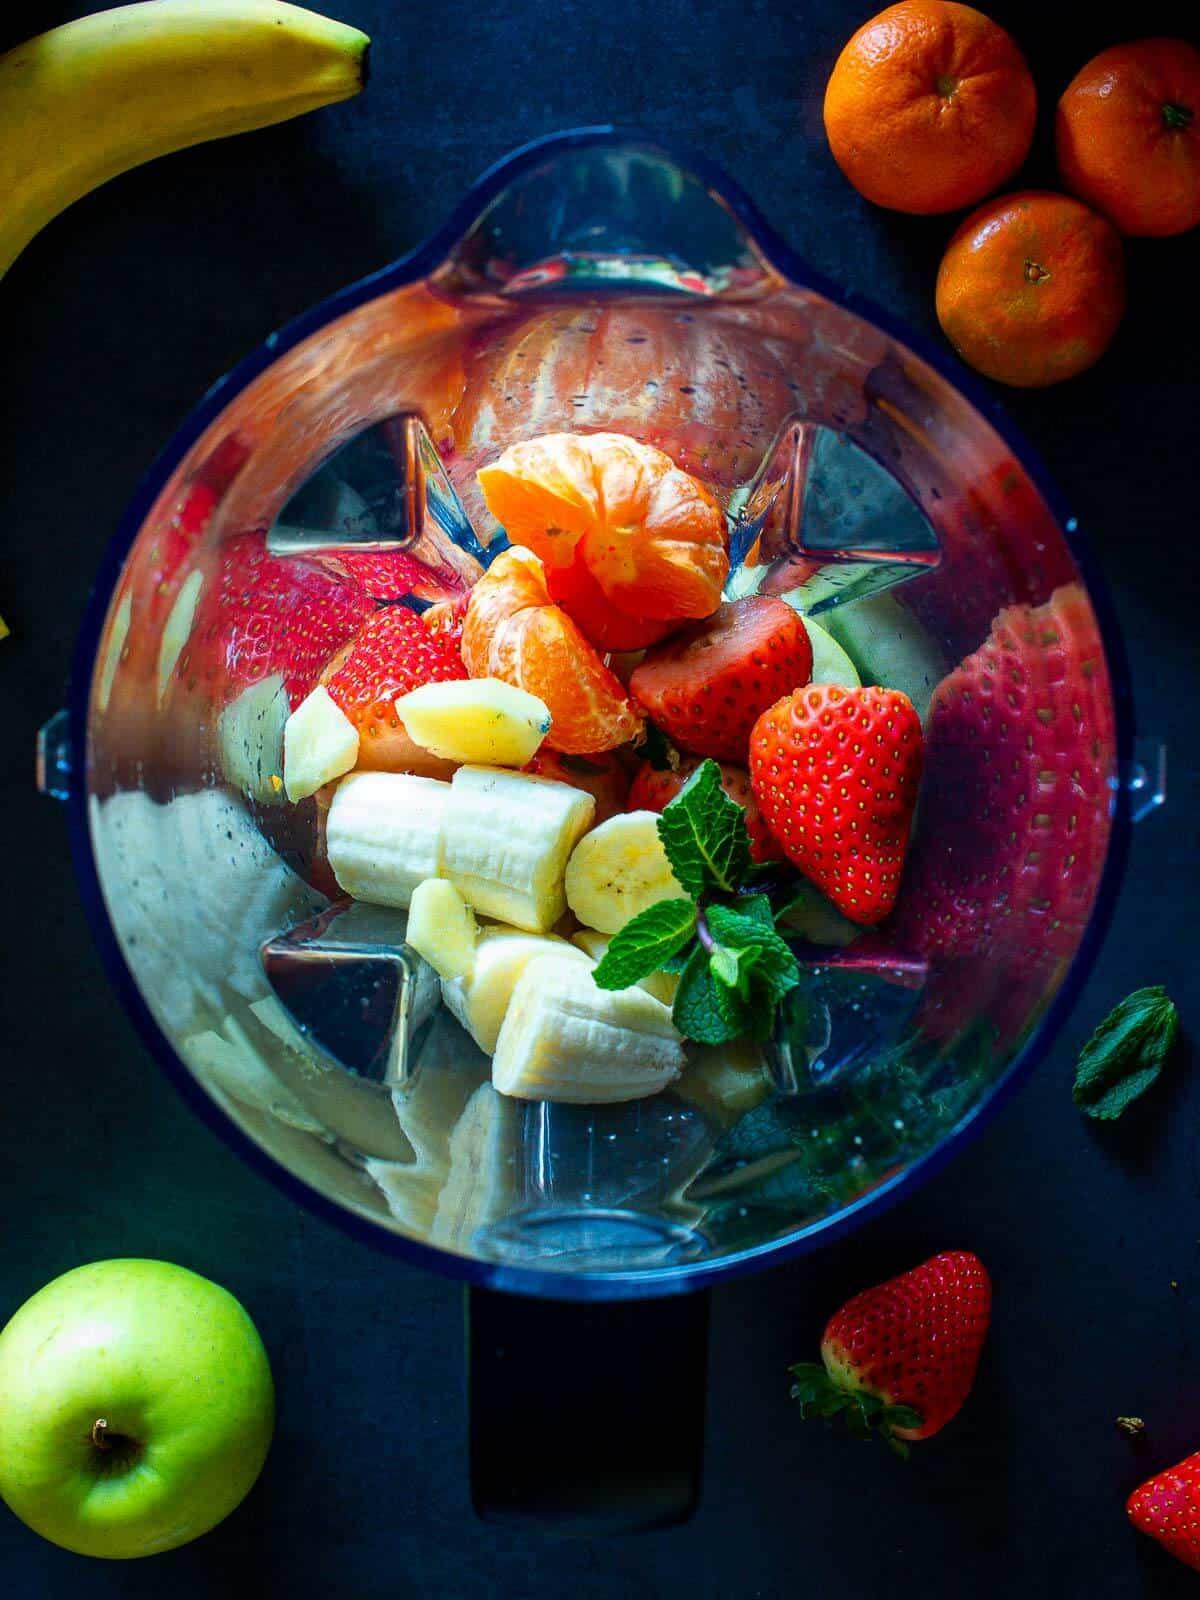 Strawberry Banana Smoothie ingredients in Blender